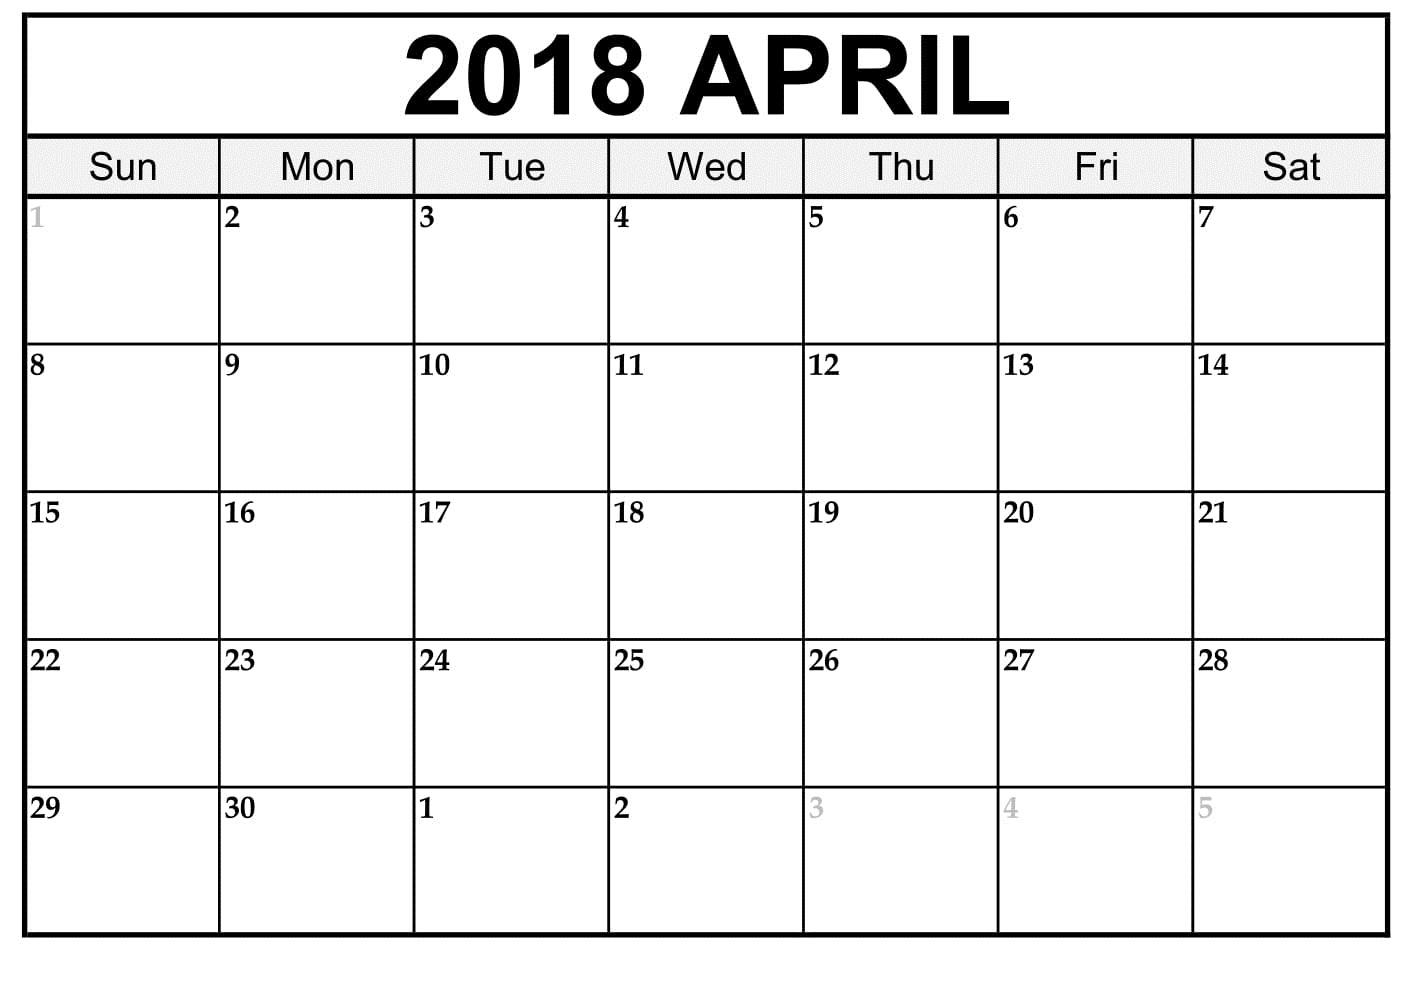 April Calendar Word - Wpa.wpart.co